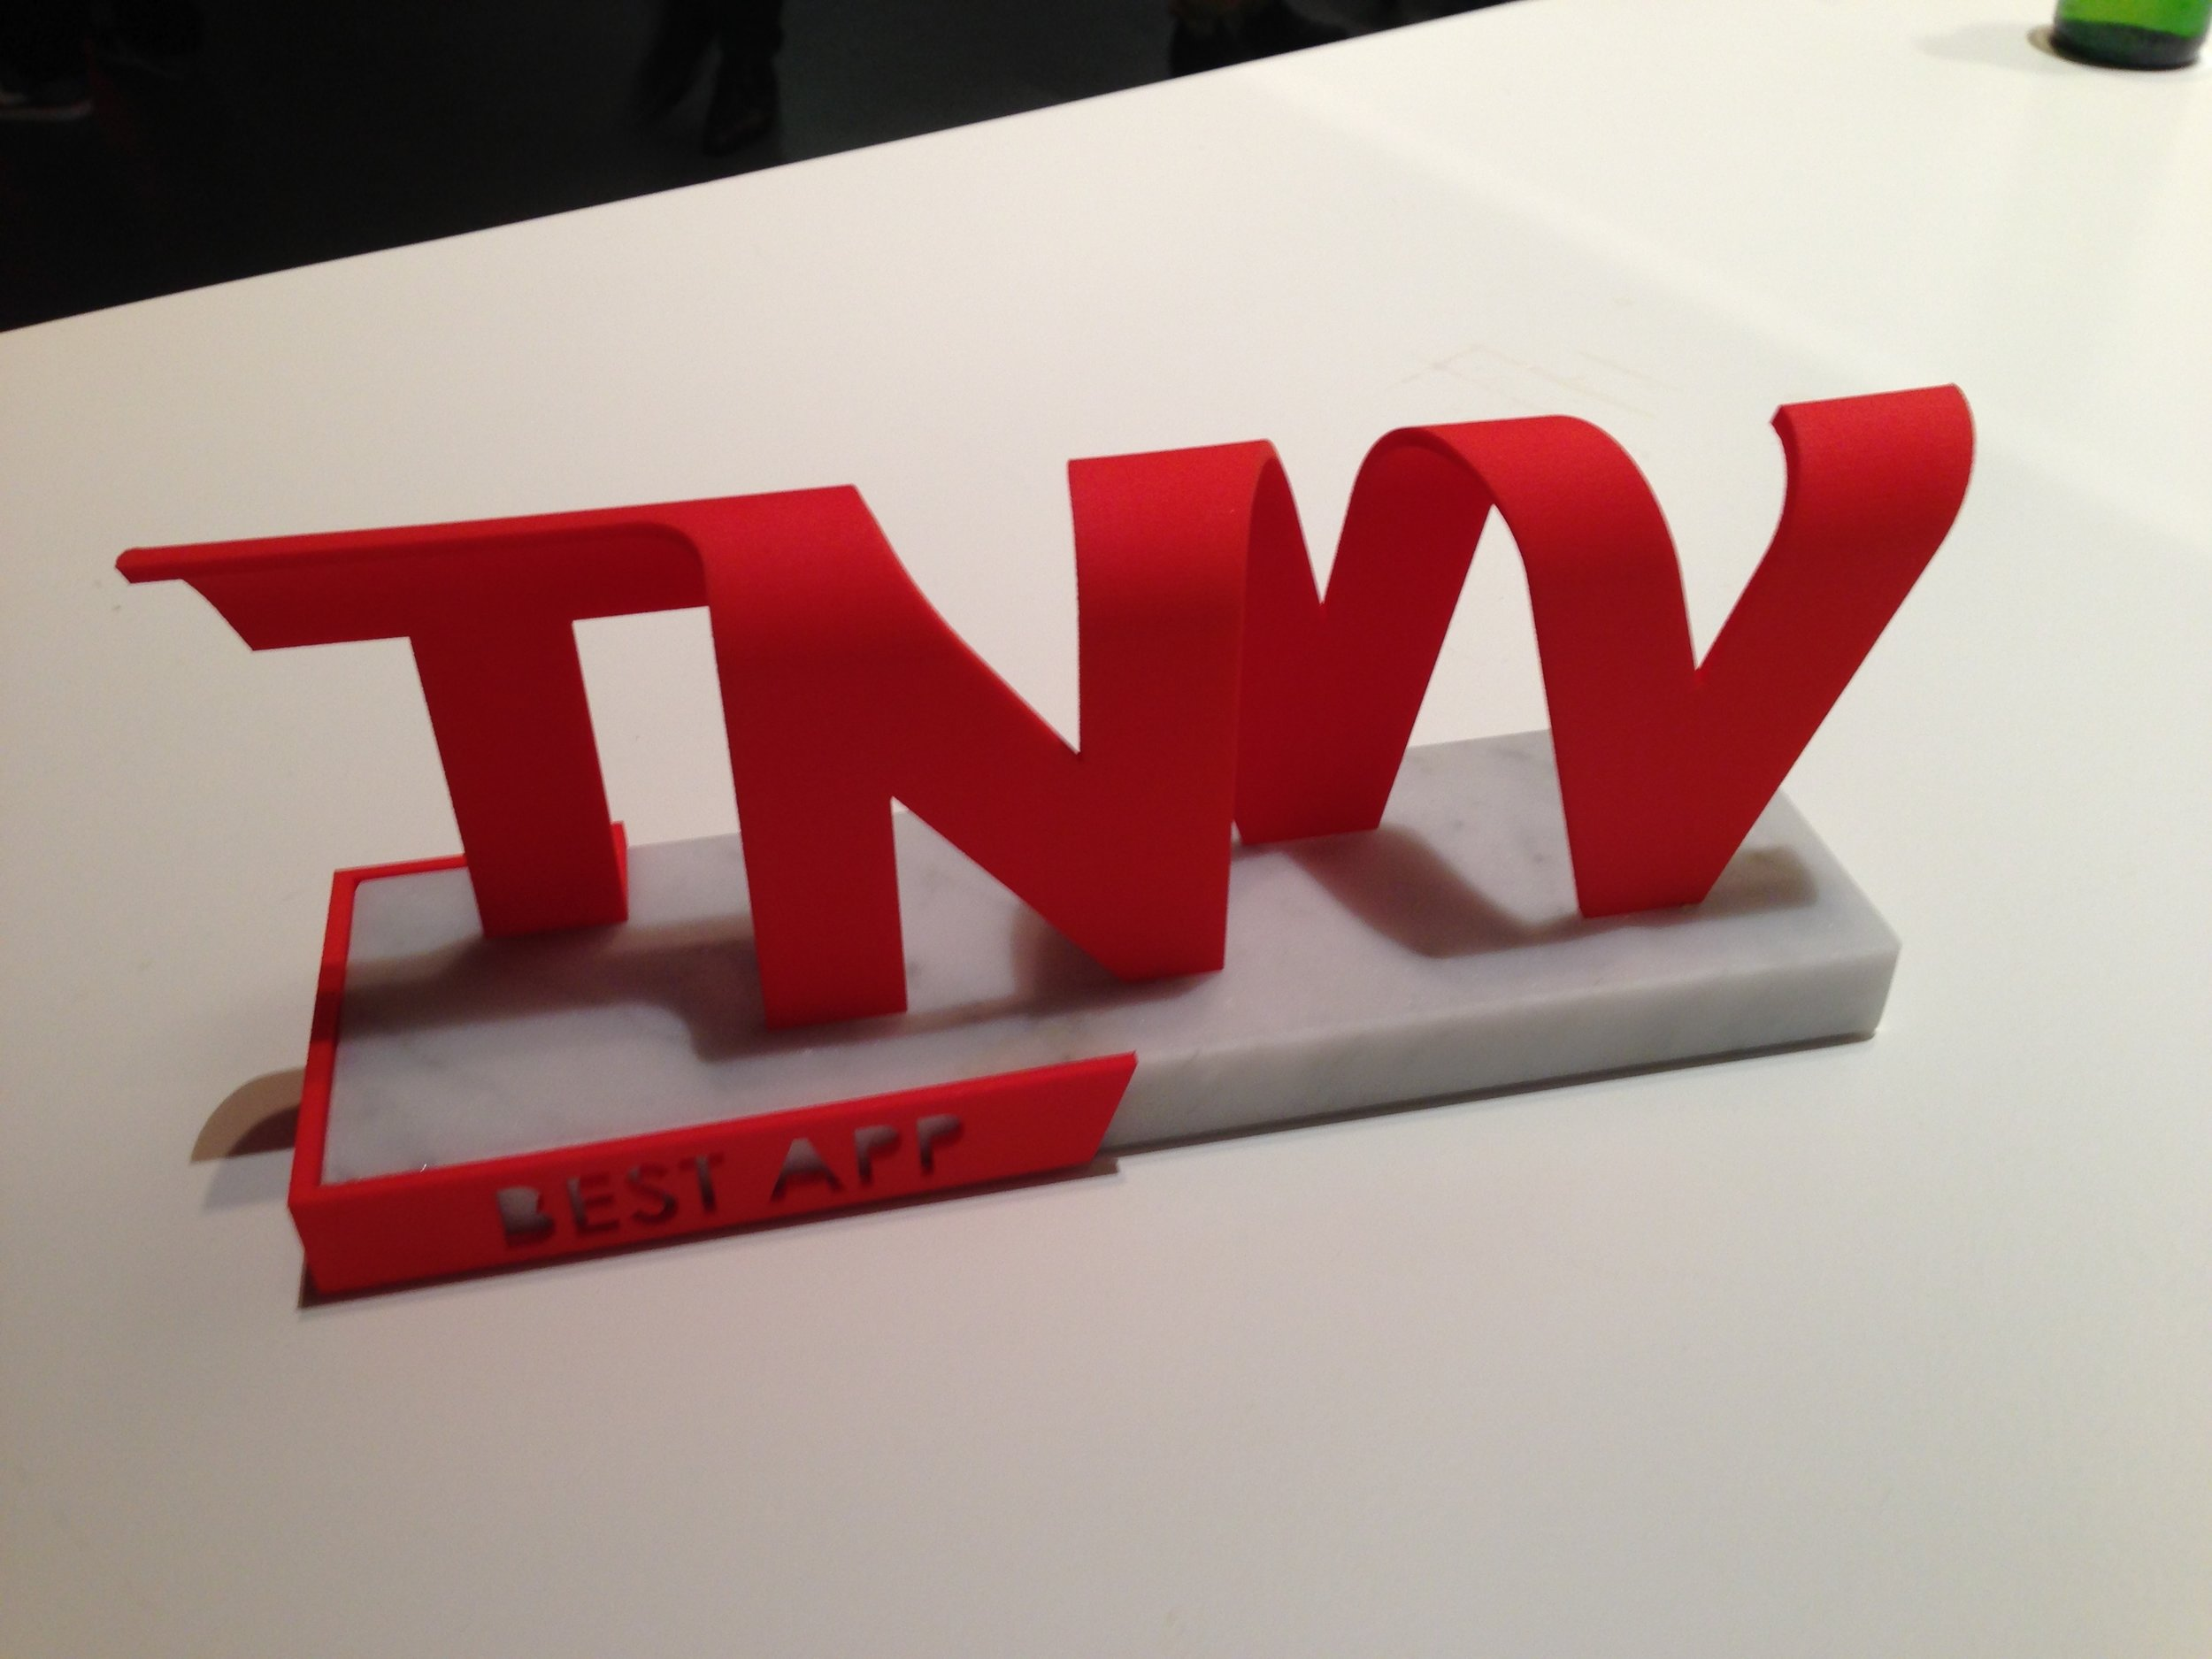 TNW Startup Trophy